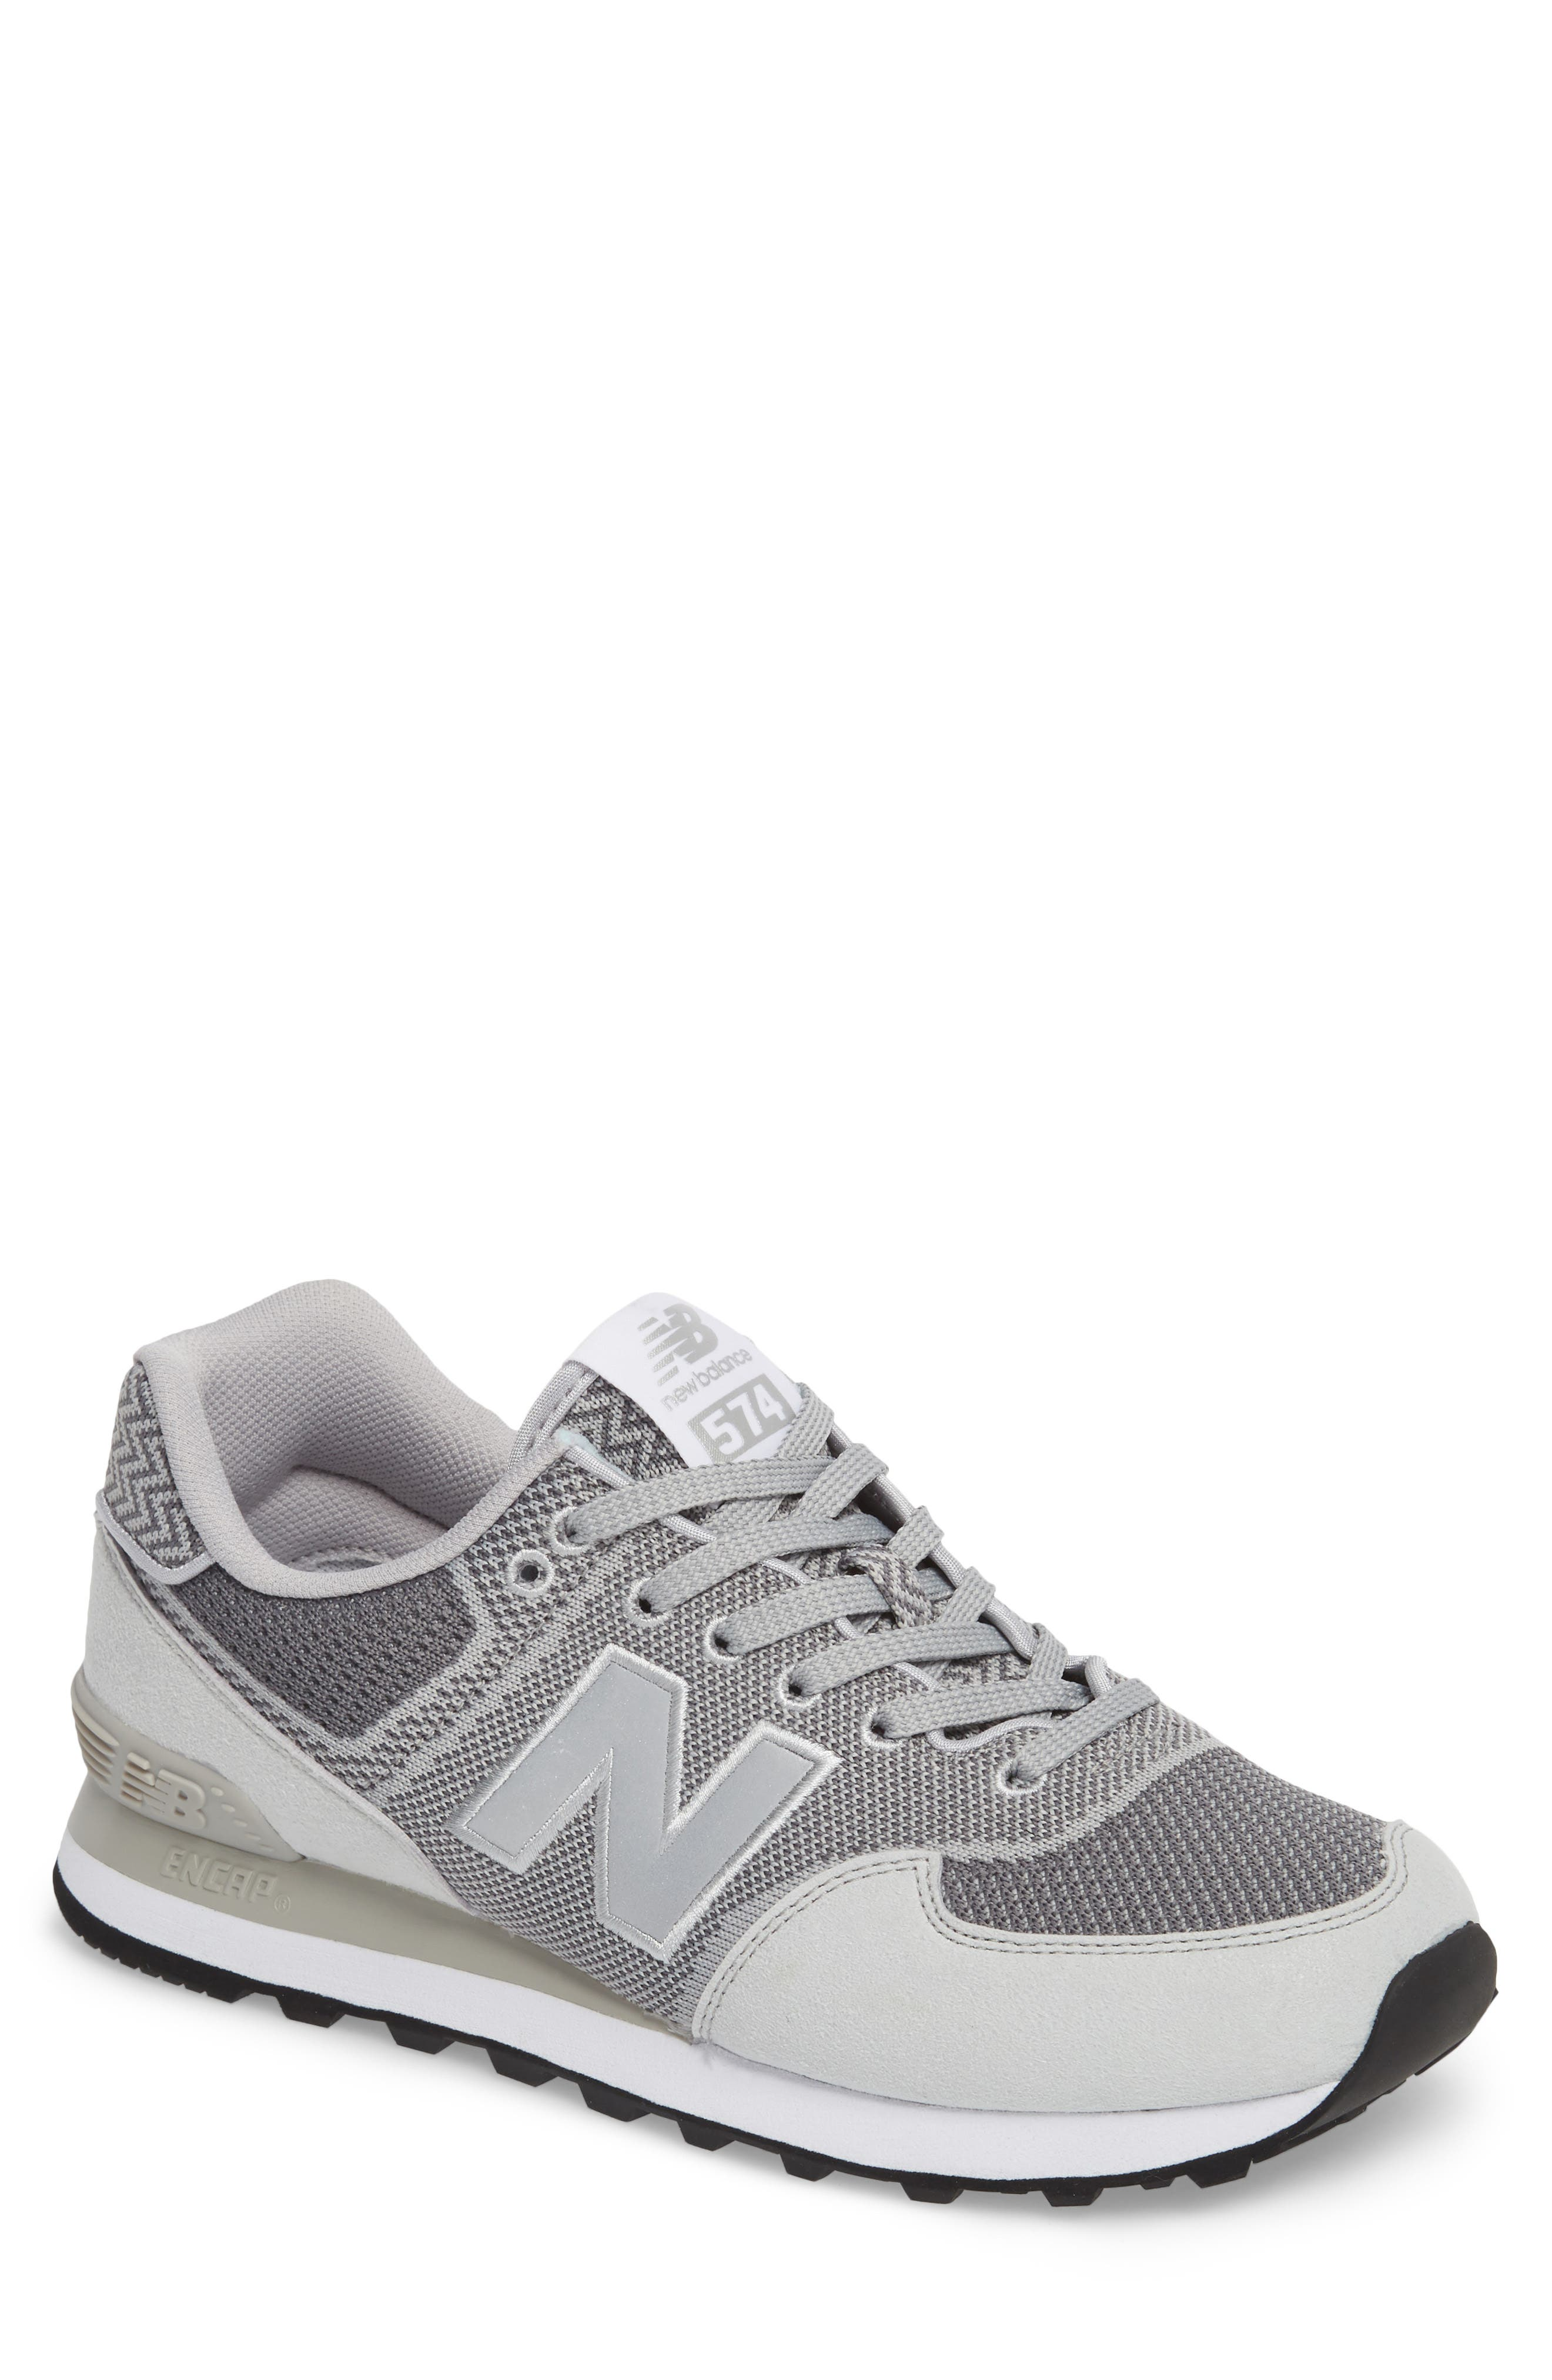 Engineered Mesh Sneaker,                         Main,                         color, Silver Mink